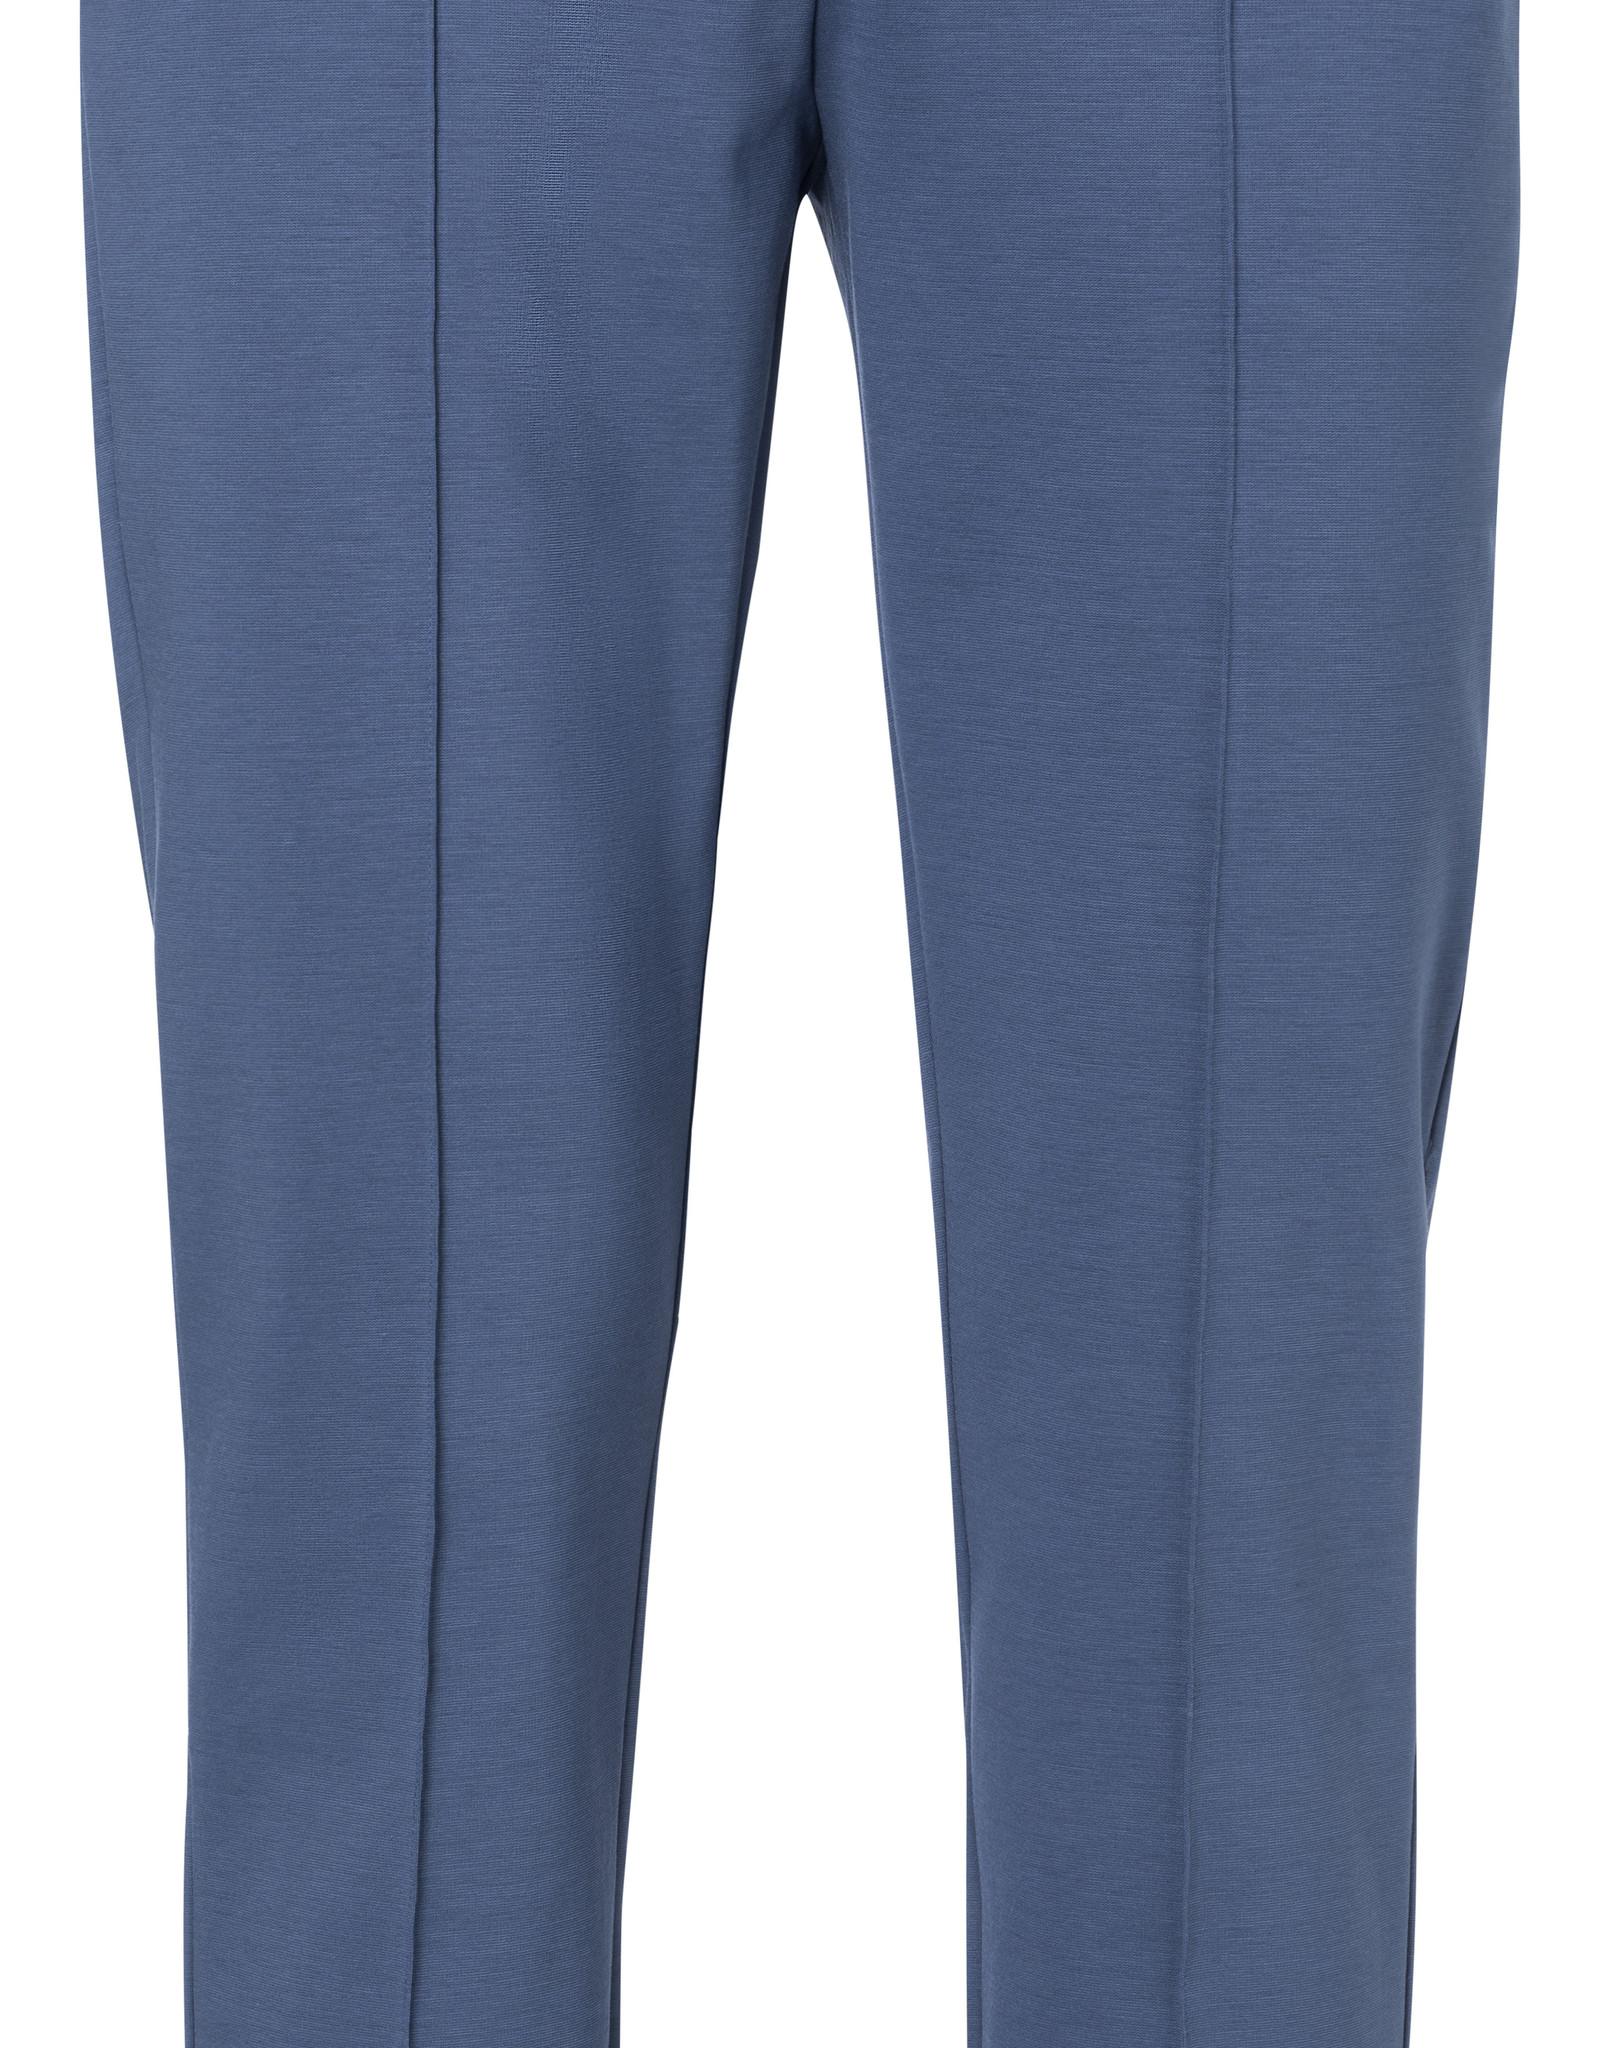 Yaya Jersey Trousers Ensign Blue